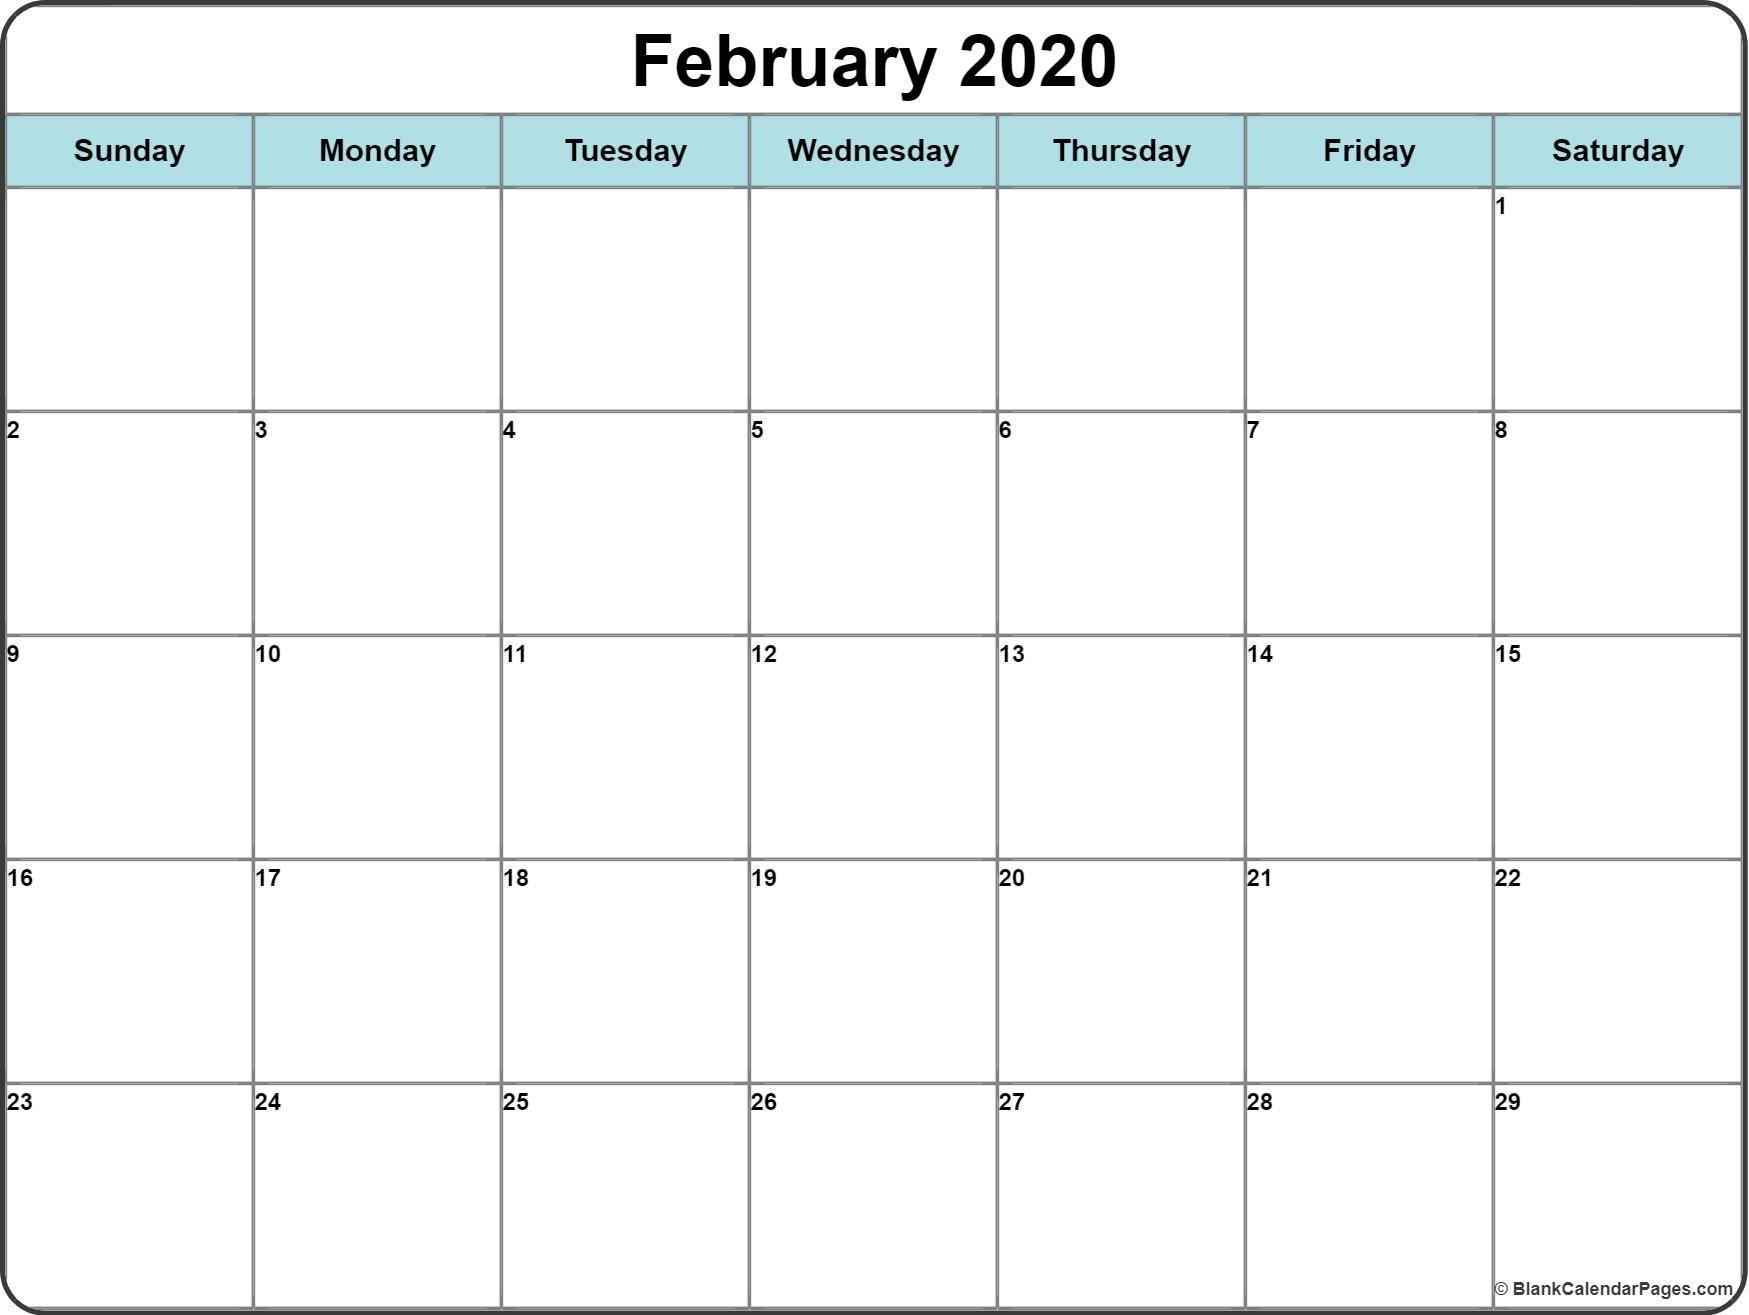 February 2020 Calendar | Free Printable Monthly Calendars with regard to Free Printable 2020 Calendar With Space To Write